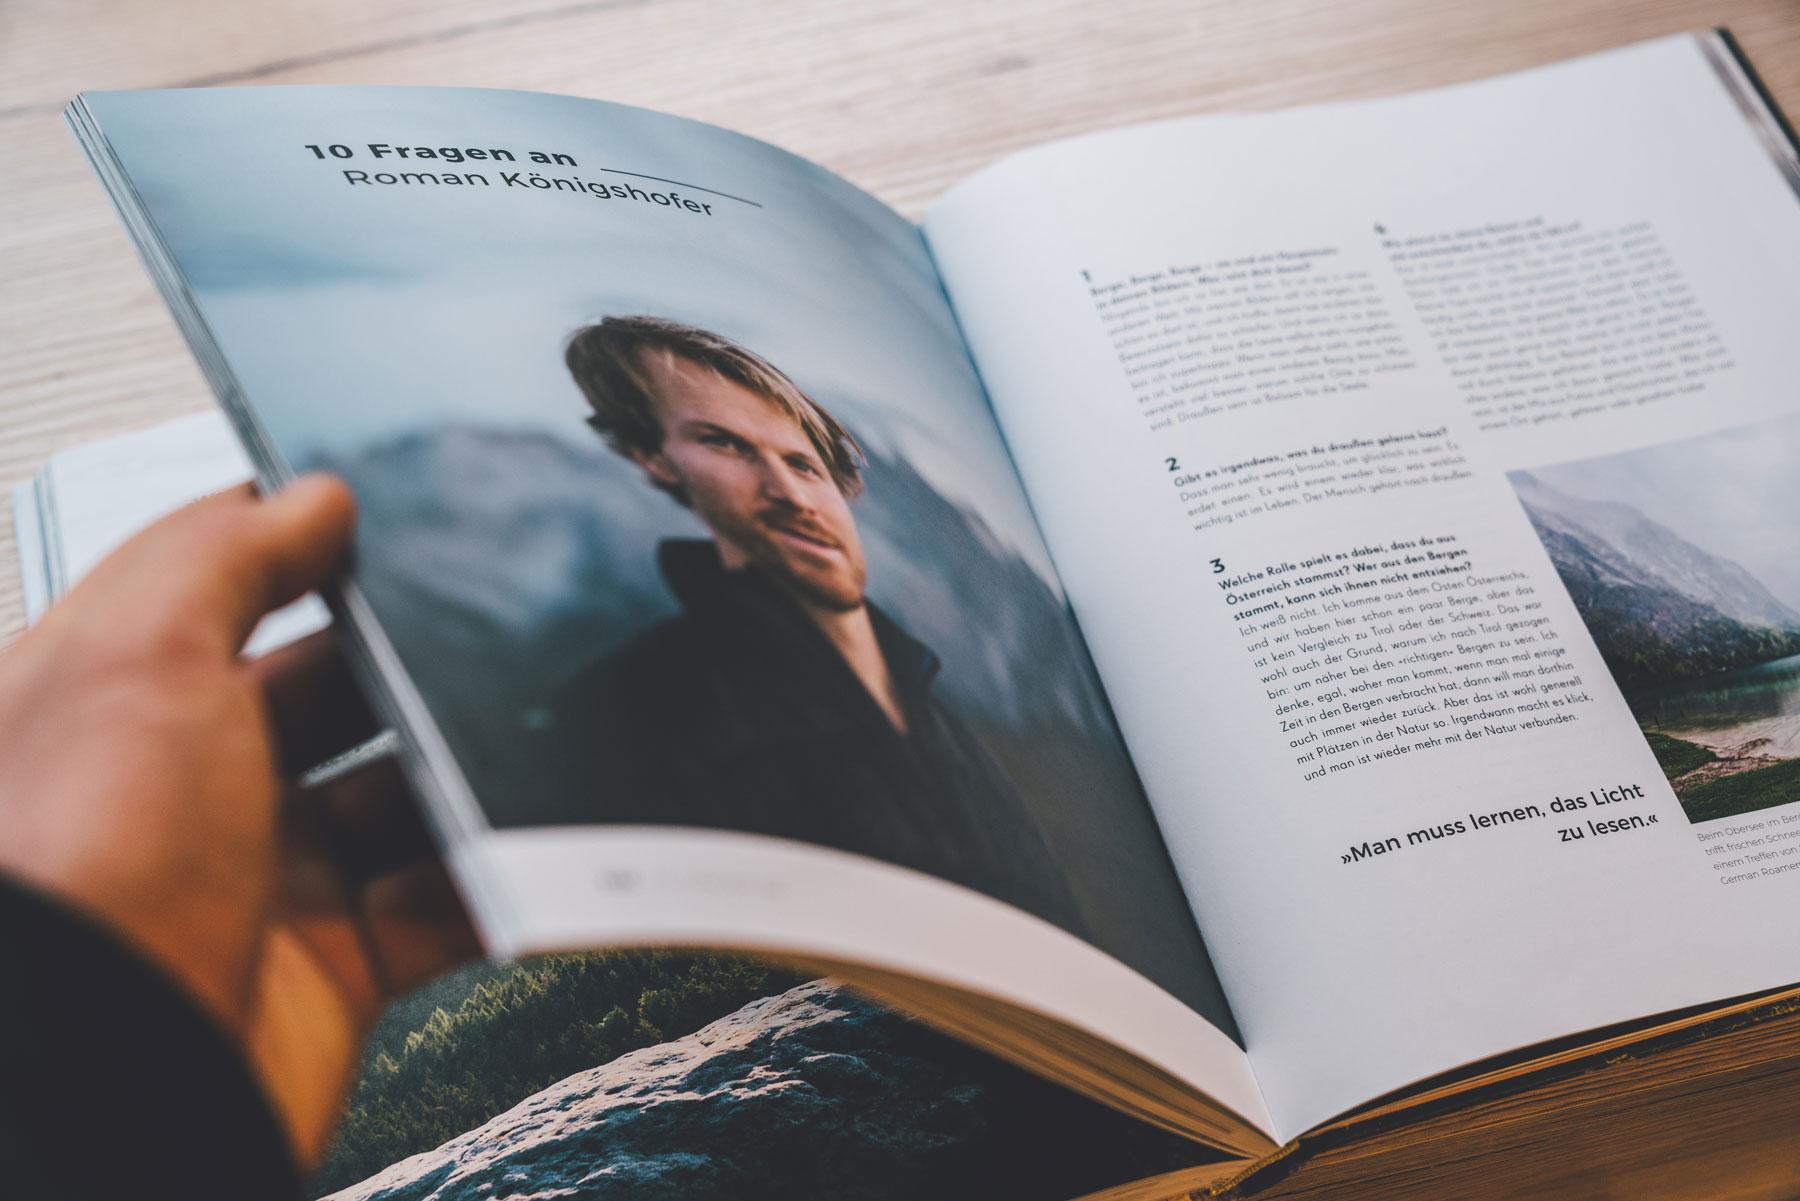 RomanKoenigshofer_Germanroamers_Book_Photographer_Outdoor_DSC04777